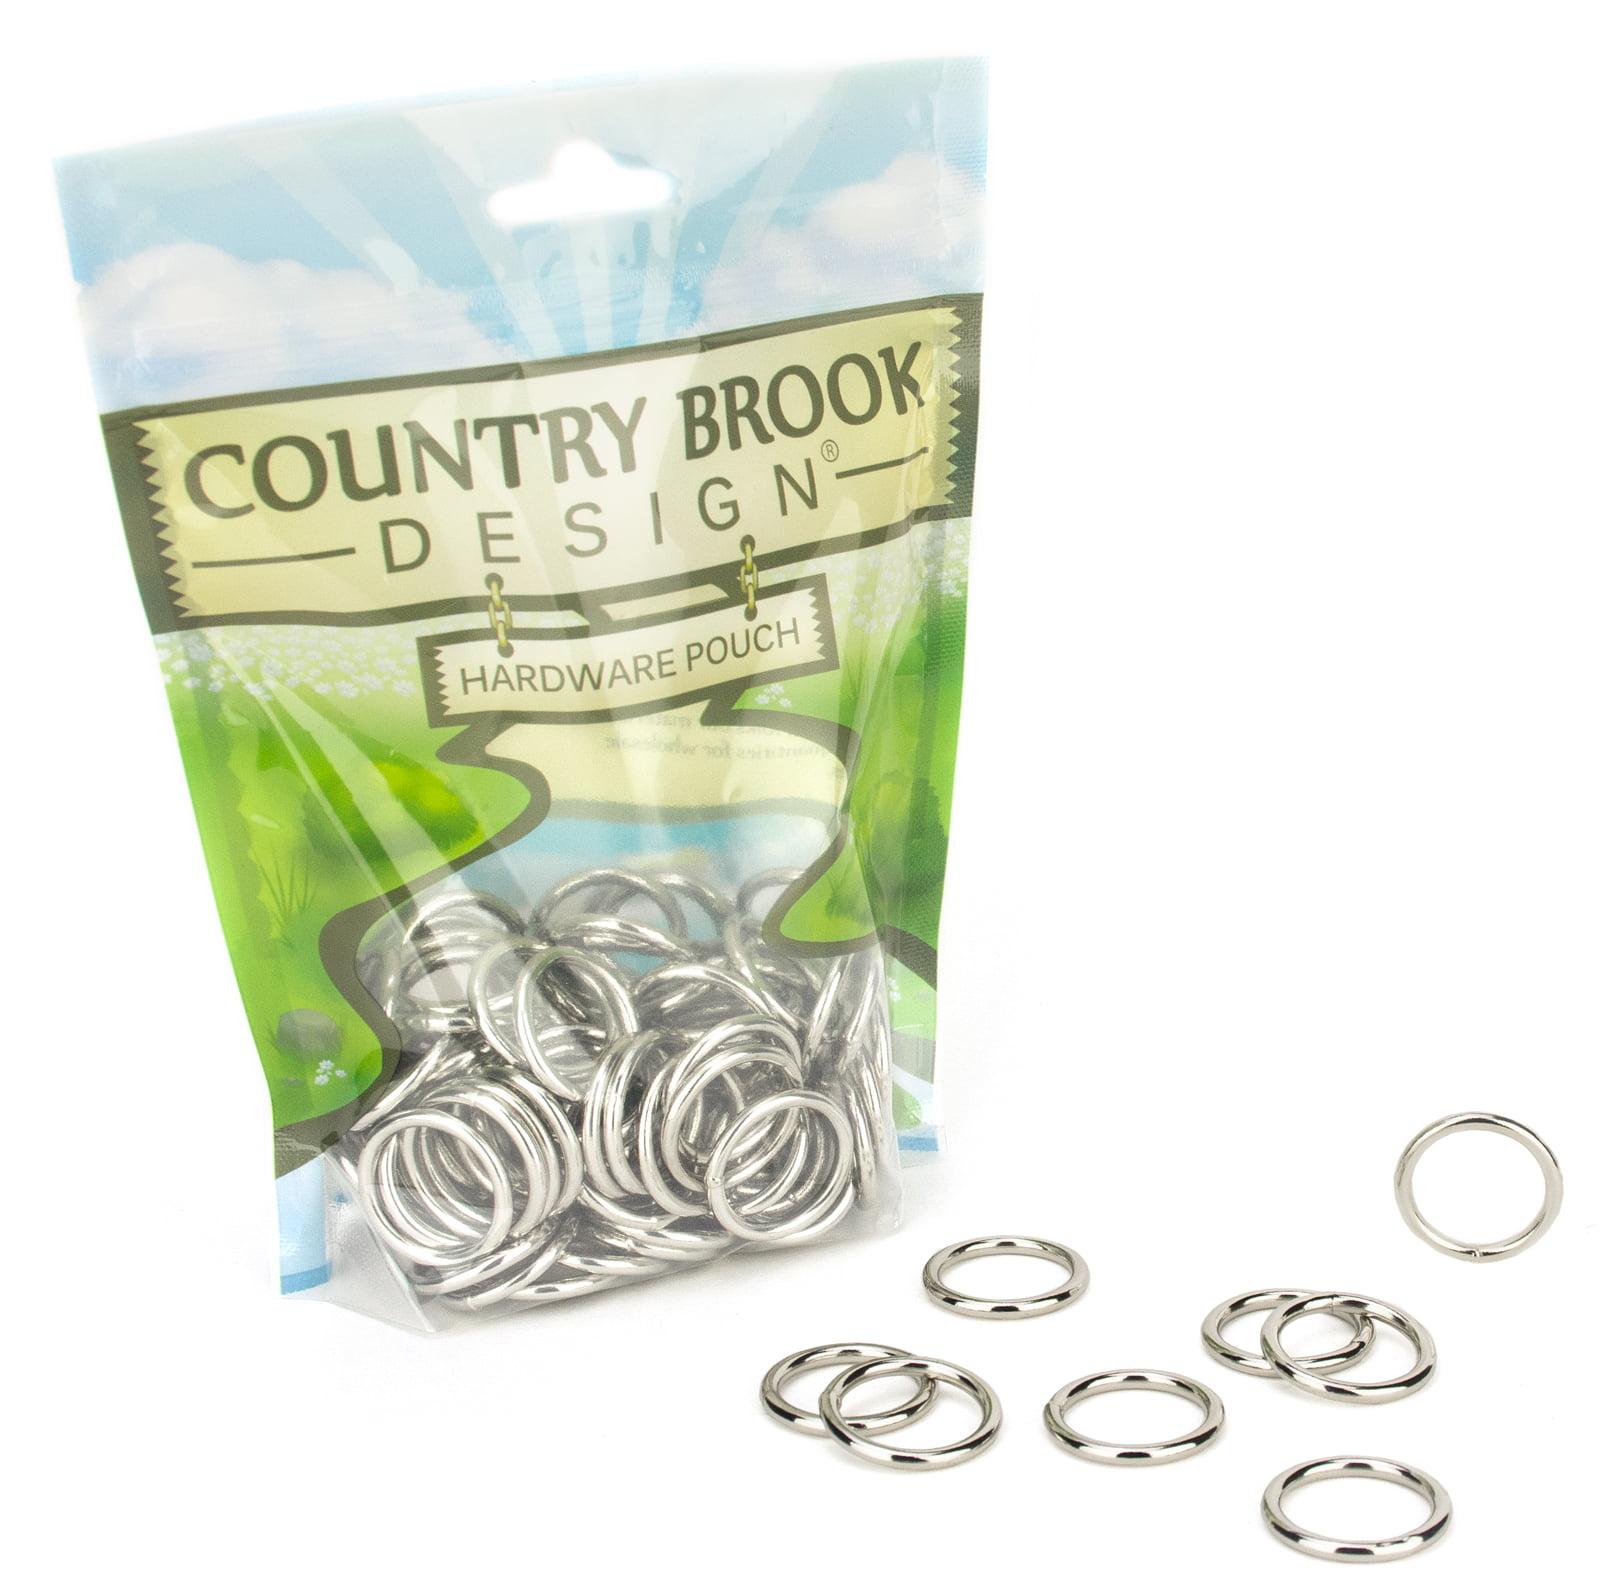 Country Brook Design | 3/4 Inch Die Cast Lite O-Rings